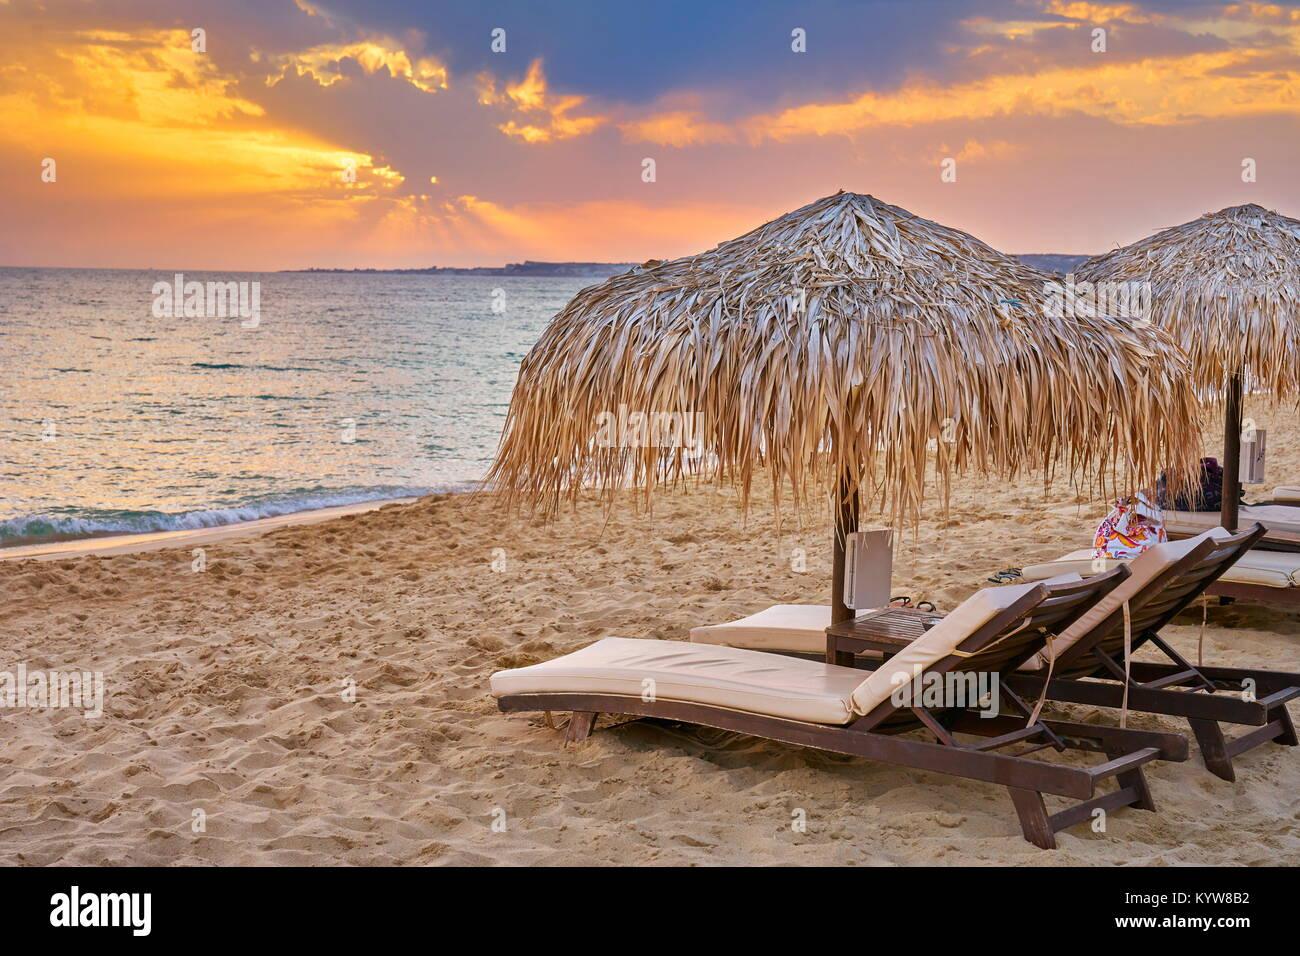 Gialos Beach at sunset, Kefalonia Island, Greece - Stock Image